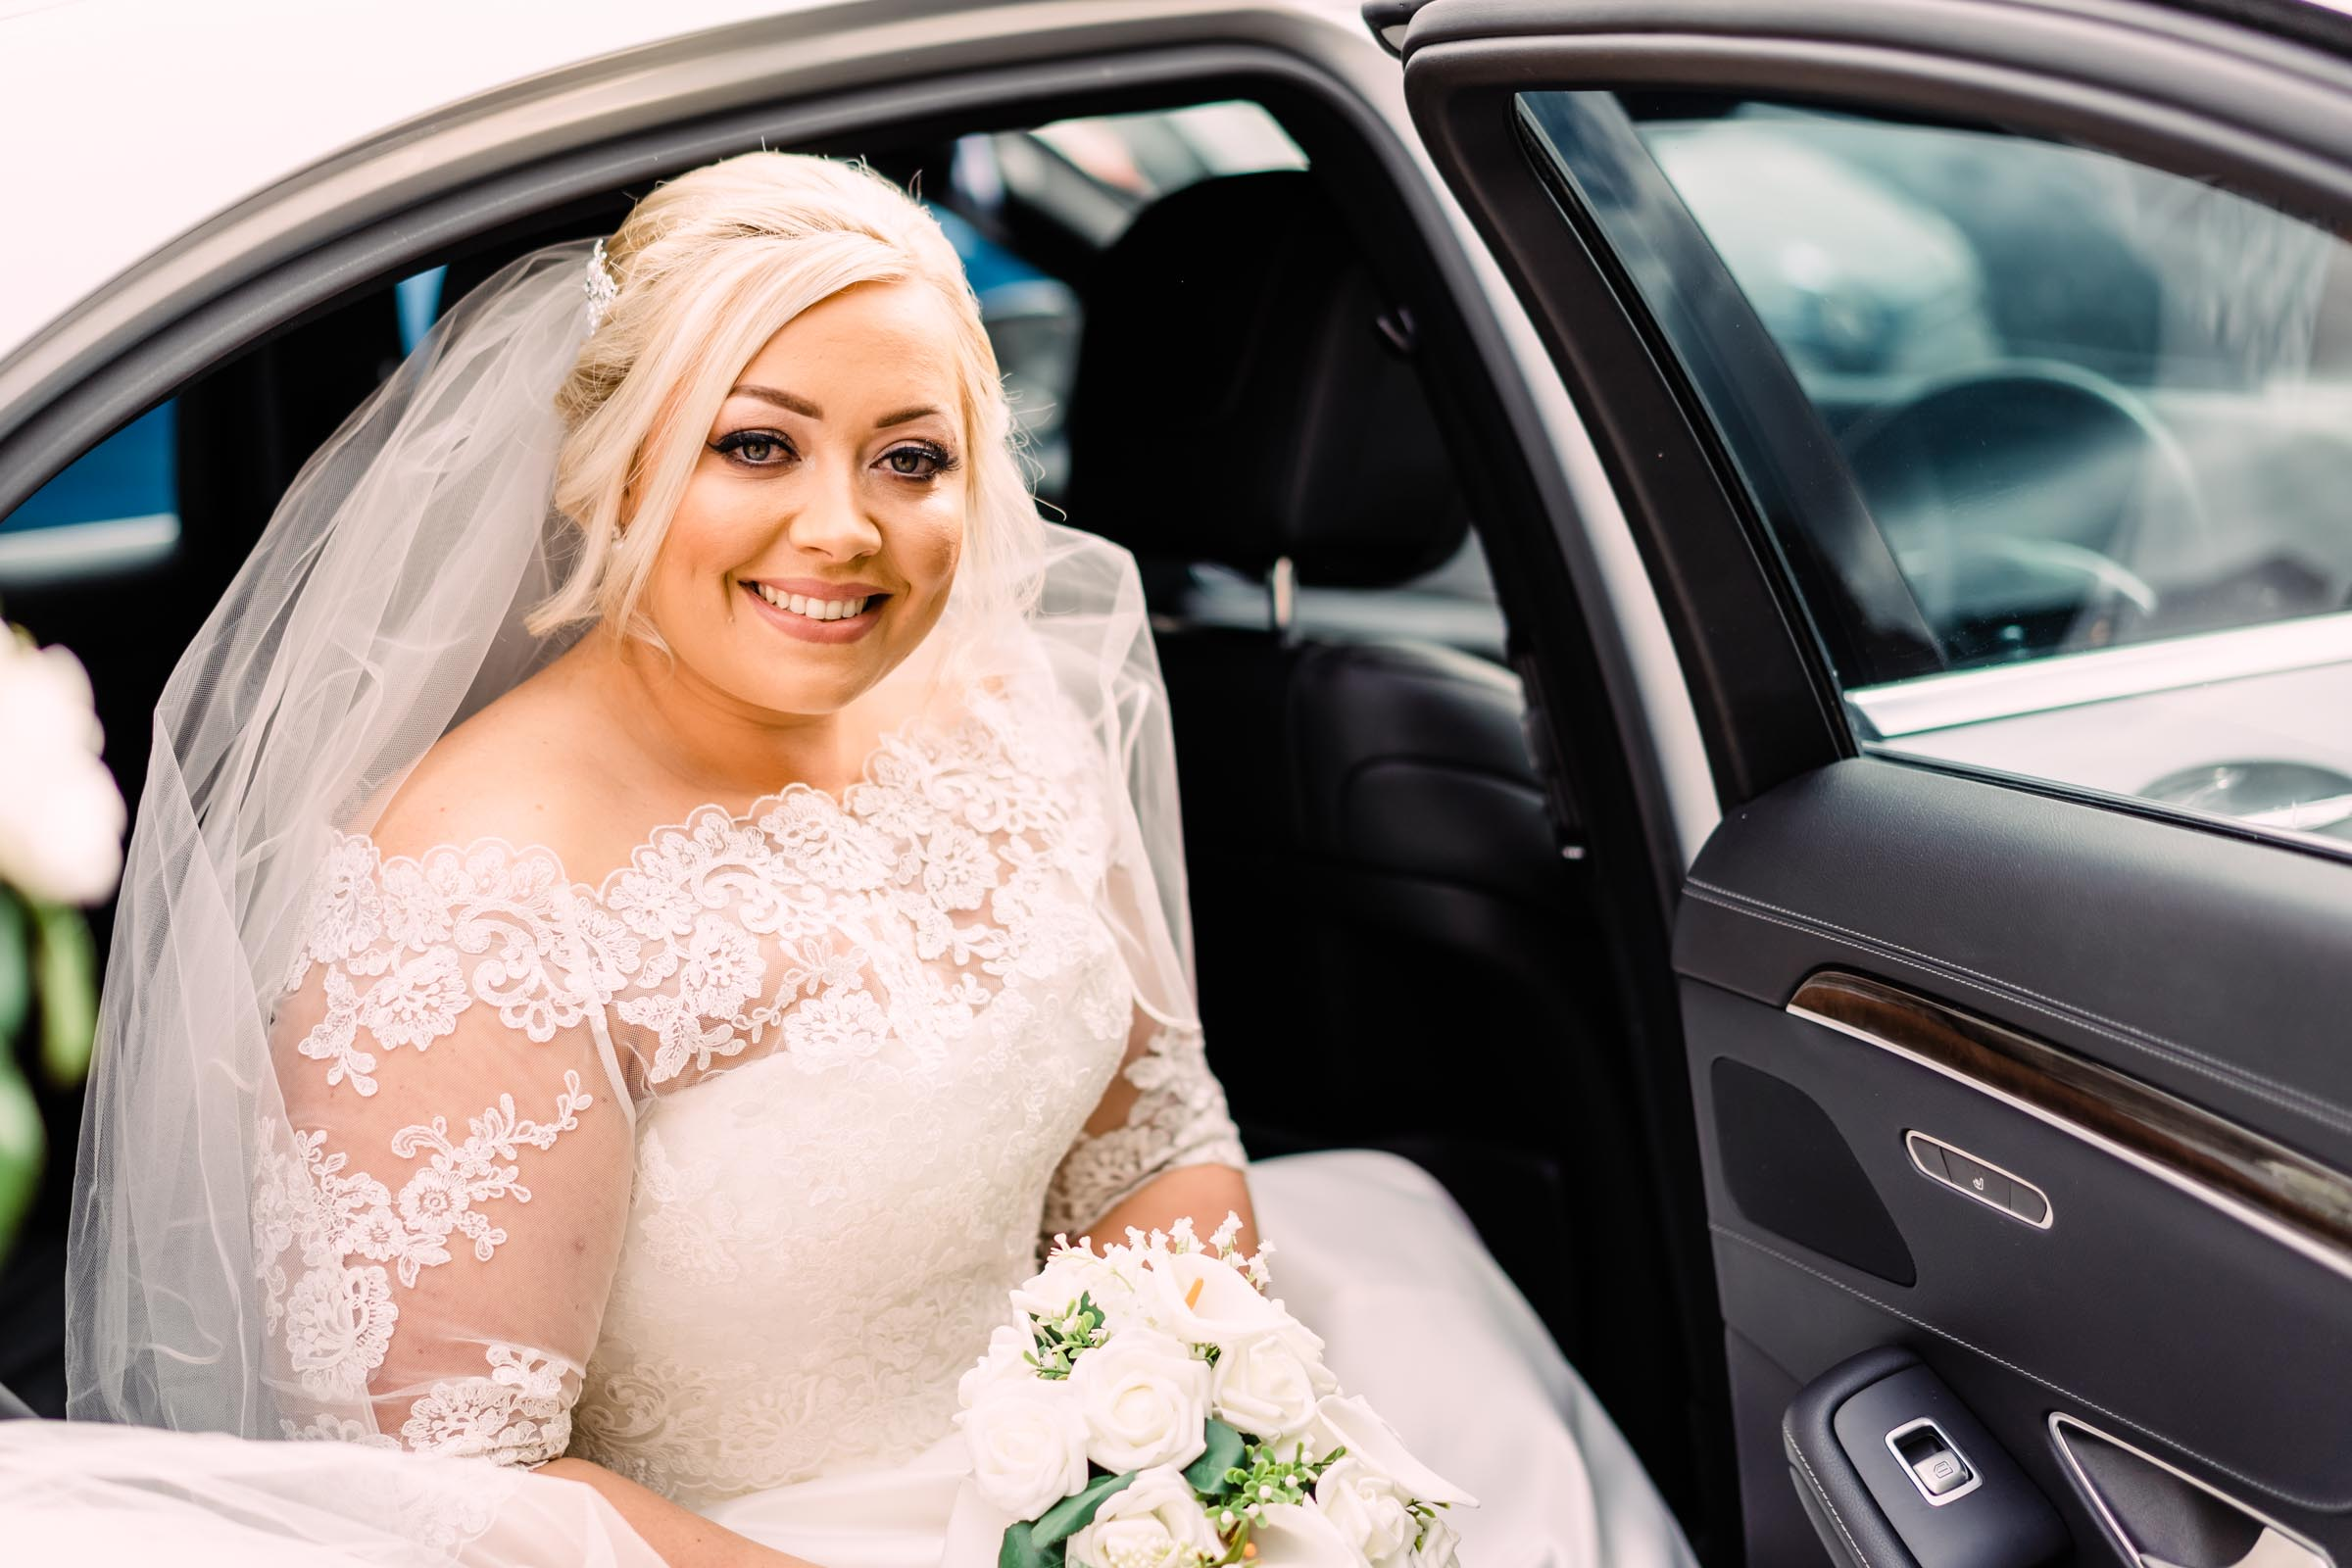 motherwell-moorings-wedding-photographer-dearlyphotography (27 of 77).jpg